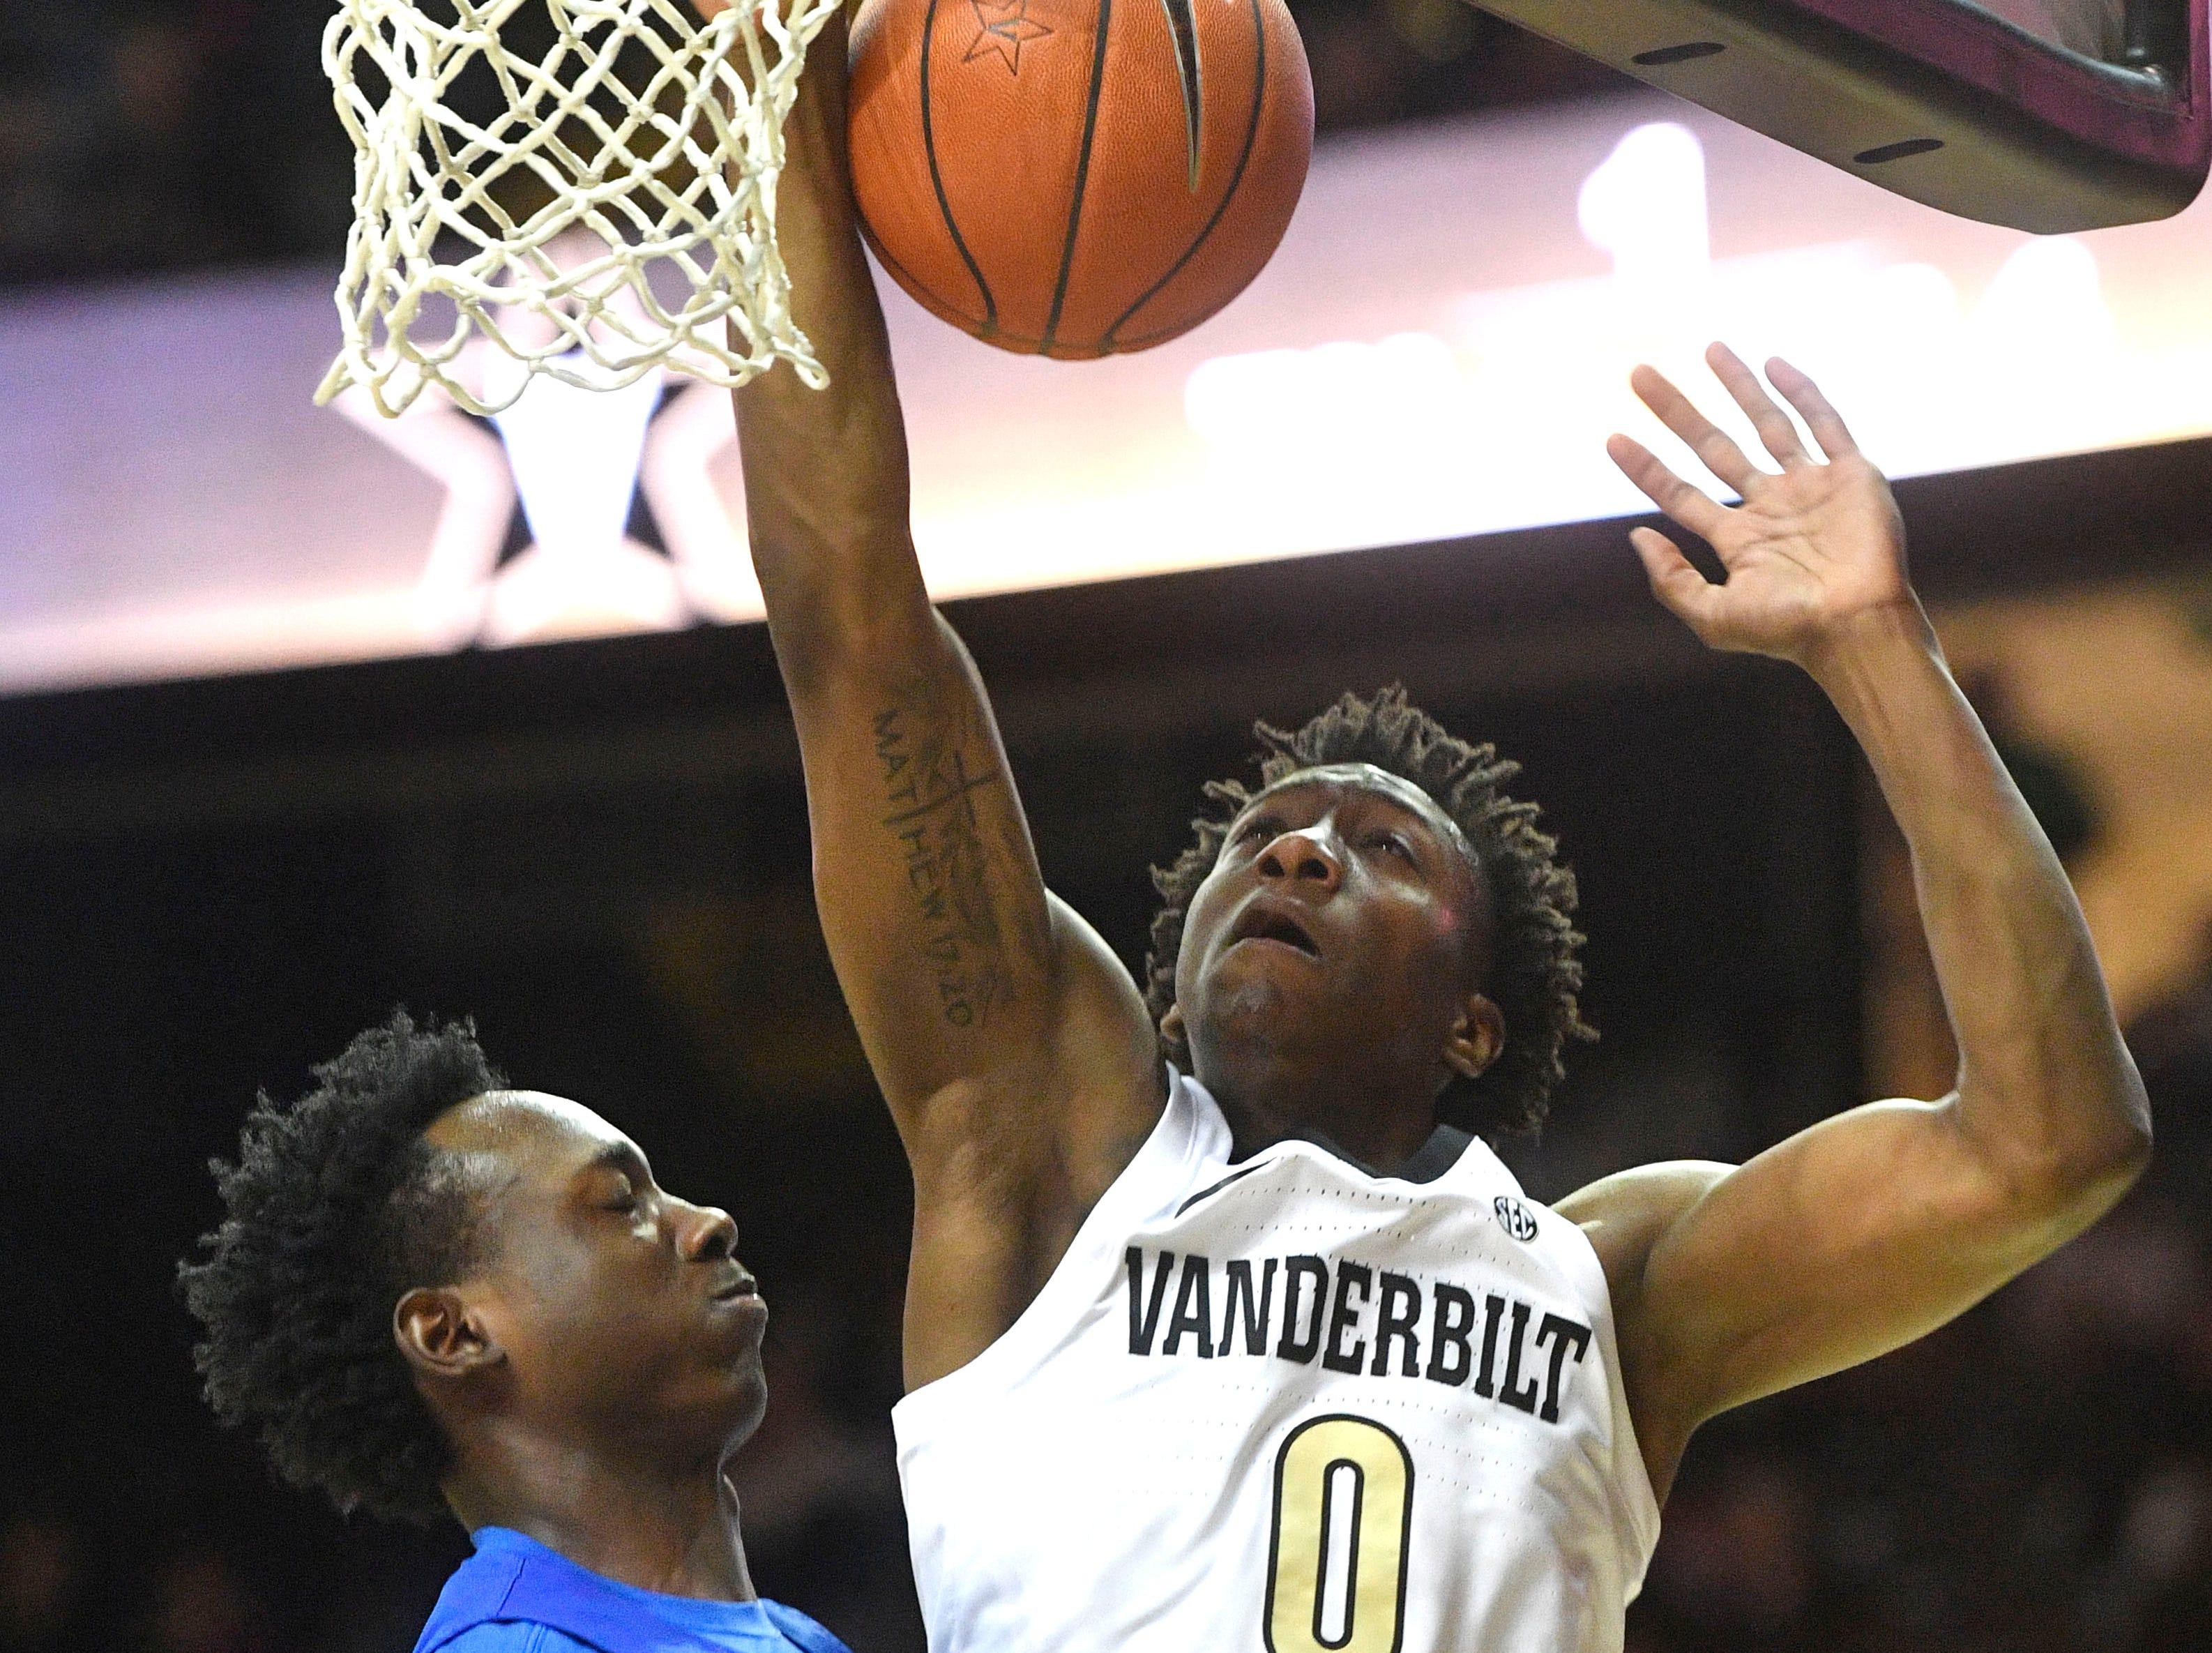 Vanderbilt Commodores guard Saben Lee (0) has the ball knocked loose as Vanderbilt plays Savannah State at Memorial Gym Tuesday Nov. 27, 2018, in Nashville, Tenn.